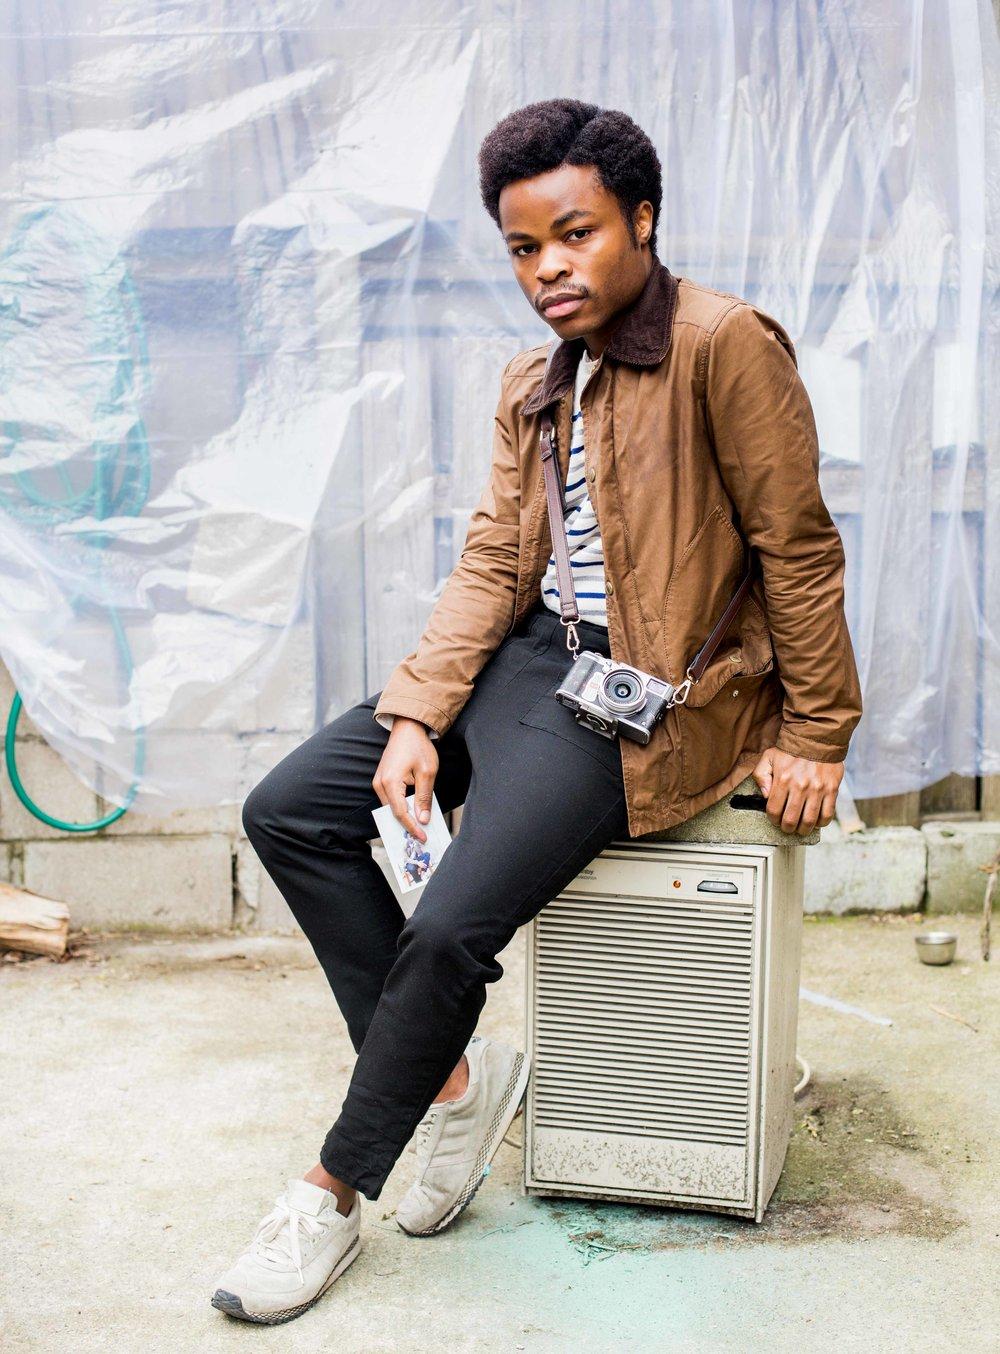 William Ukoh, Artist  Photograph by Yannick Anton